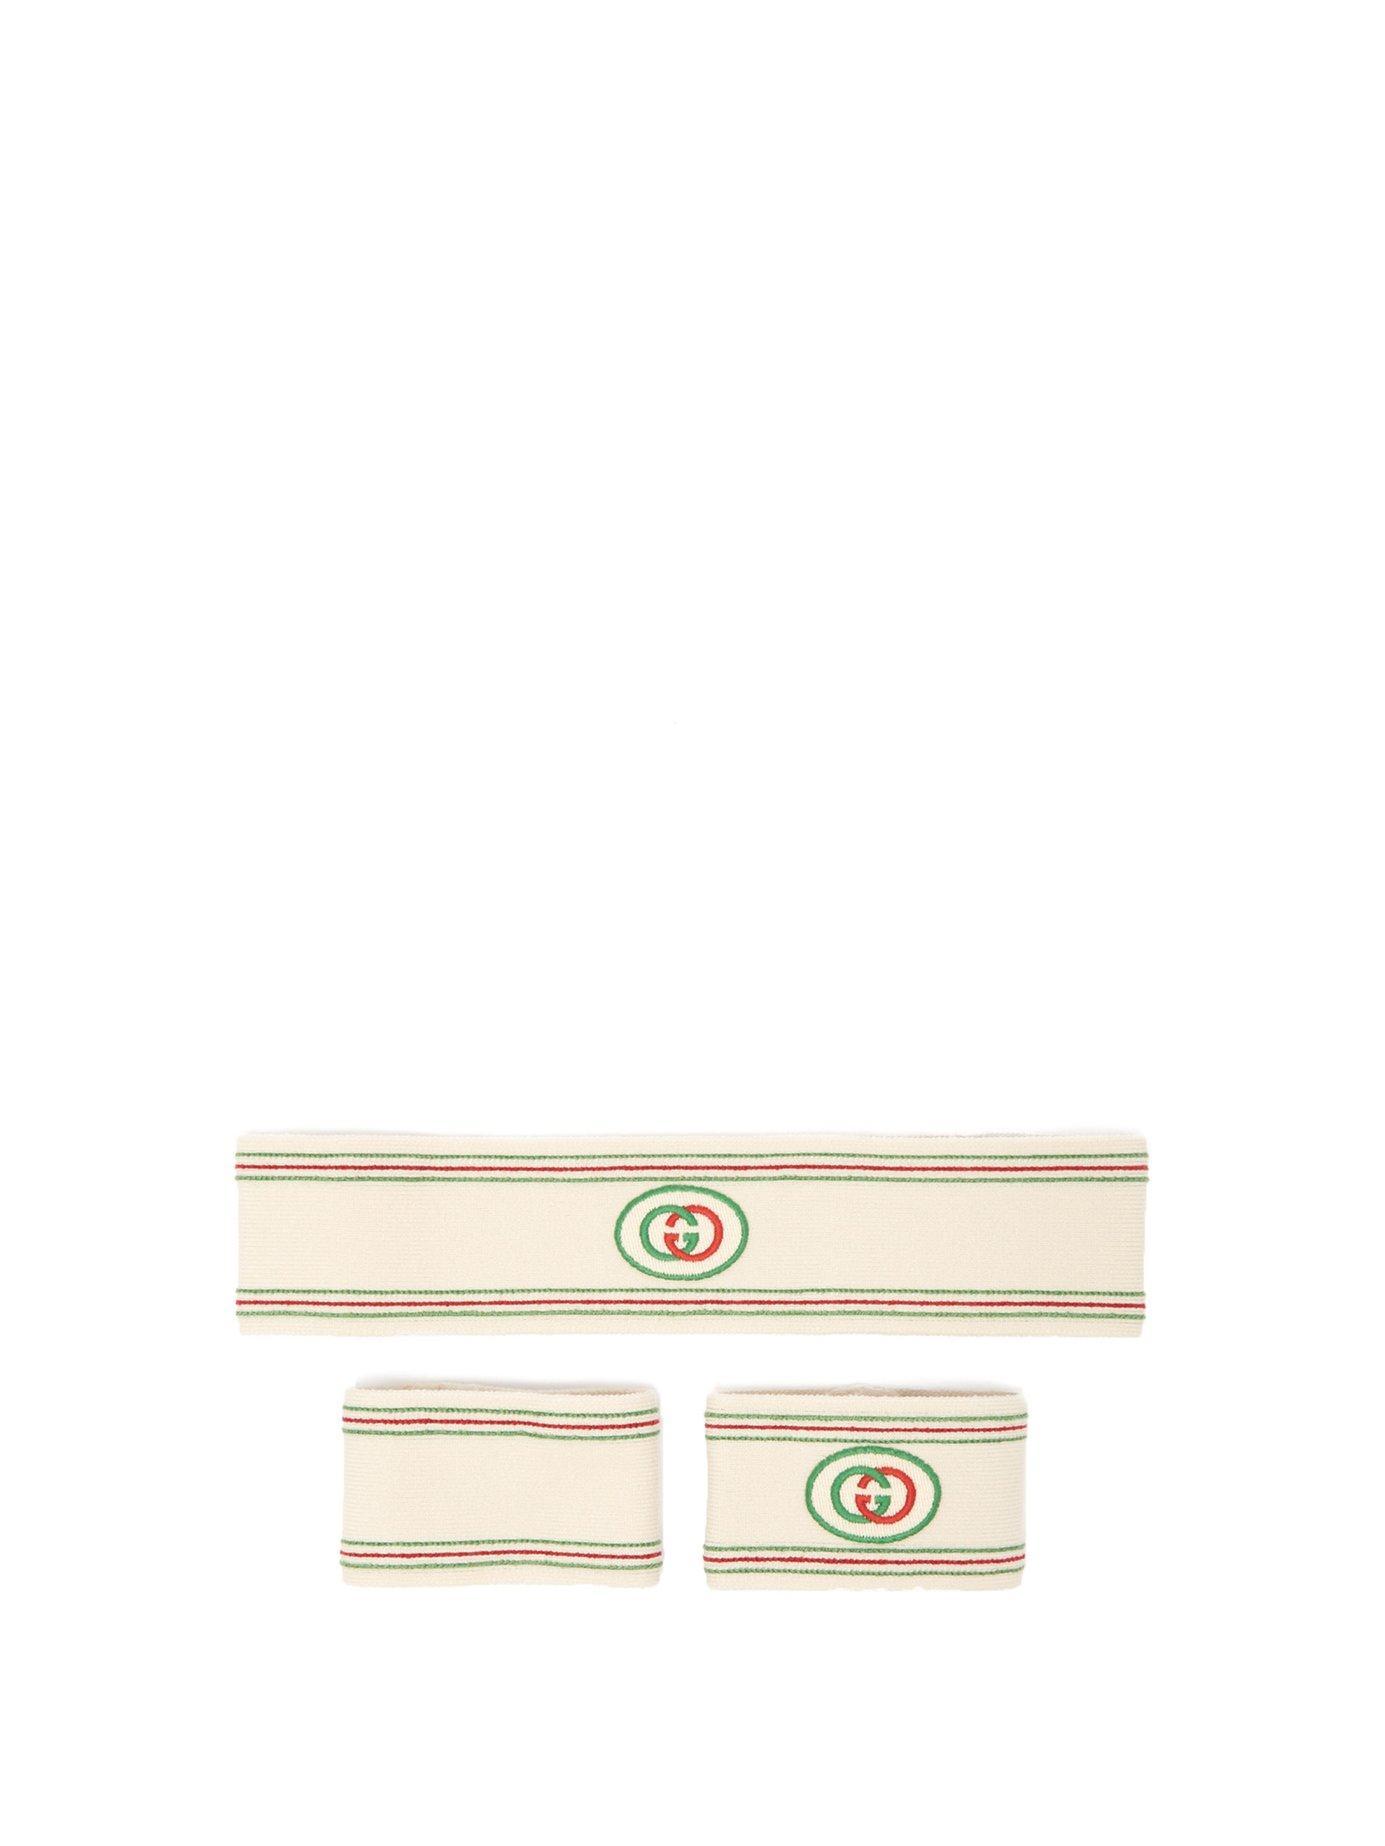 cc877fc2dff Lyst - Gucci Gg Web Stripe Head And Wristband Set for Men